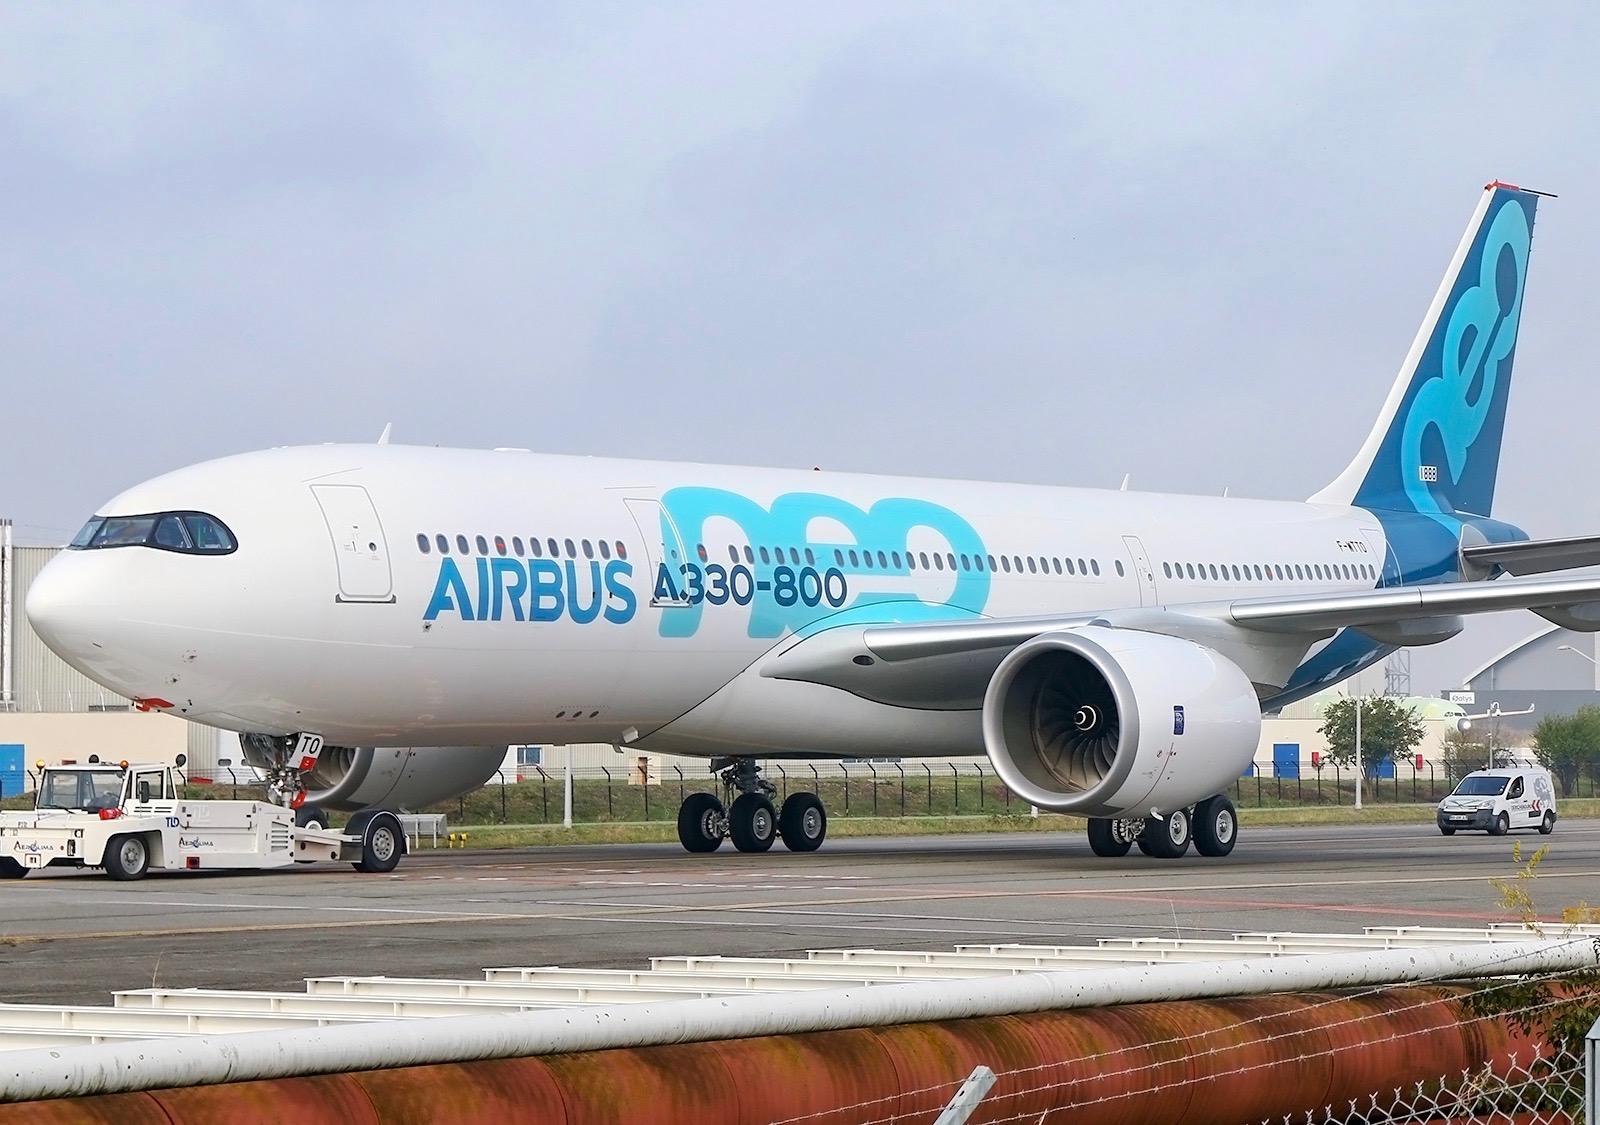 Airbus A330-800 / F-WTTO - MSN1888